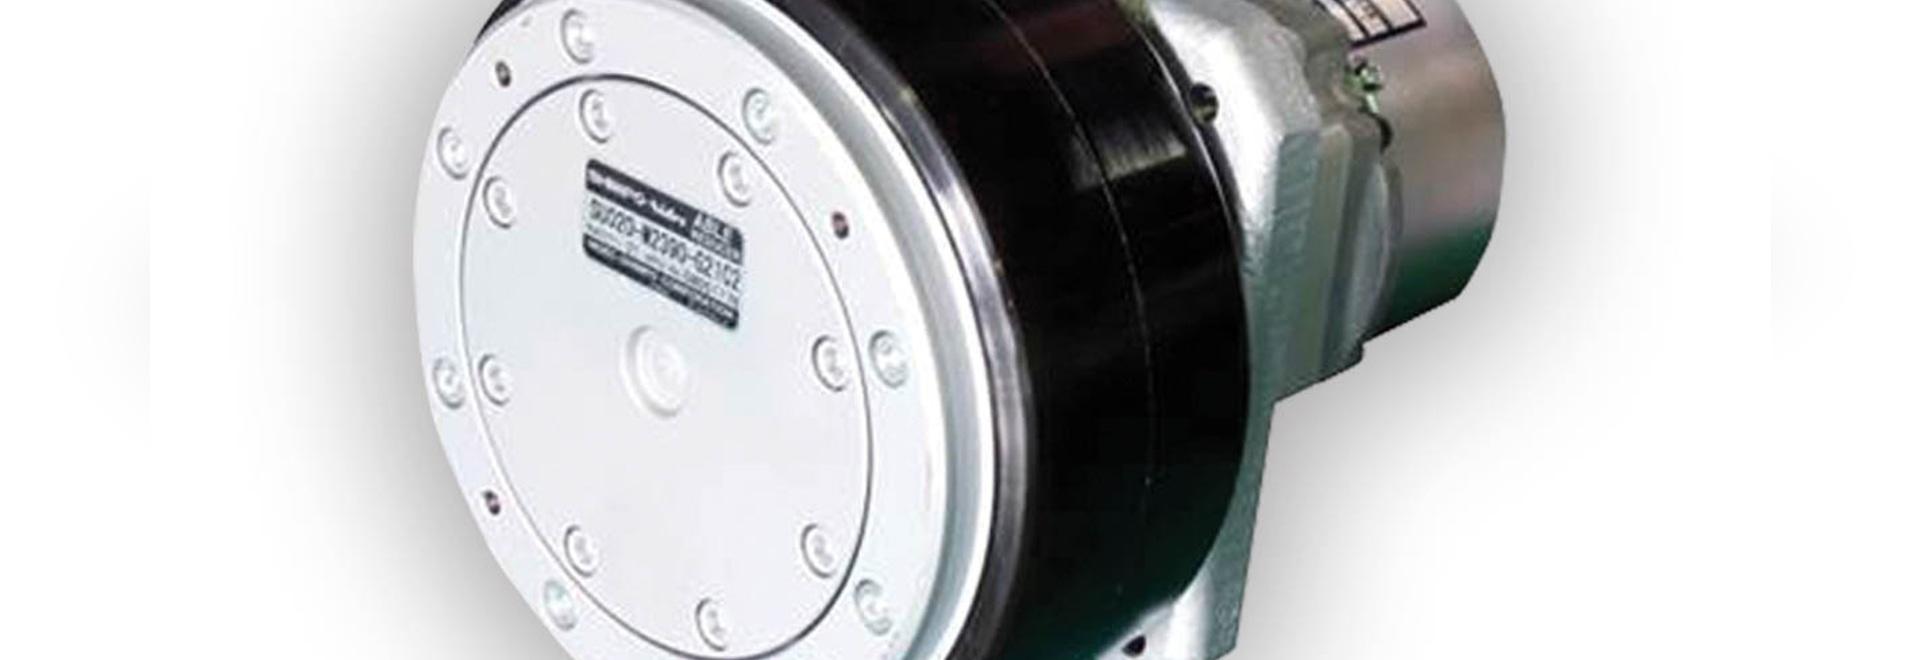 NEW Nidec-SHIMPO SU Series Wheel Drive for AGV and Mobile